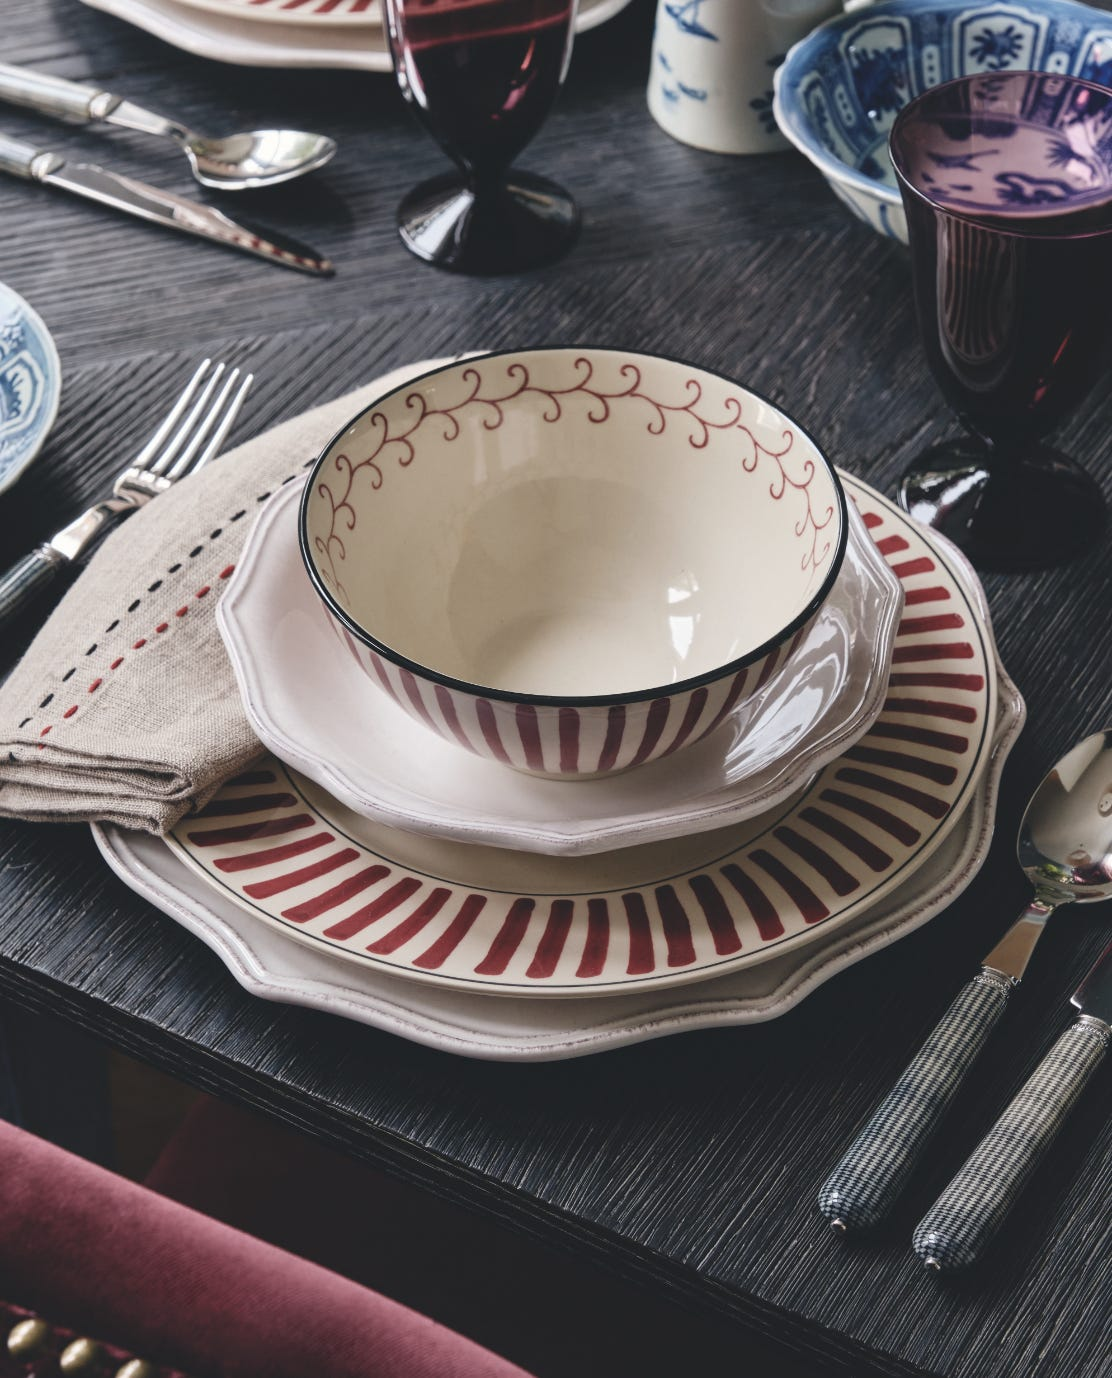 Striped Kintaro tableware on a dark wood table